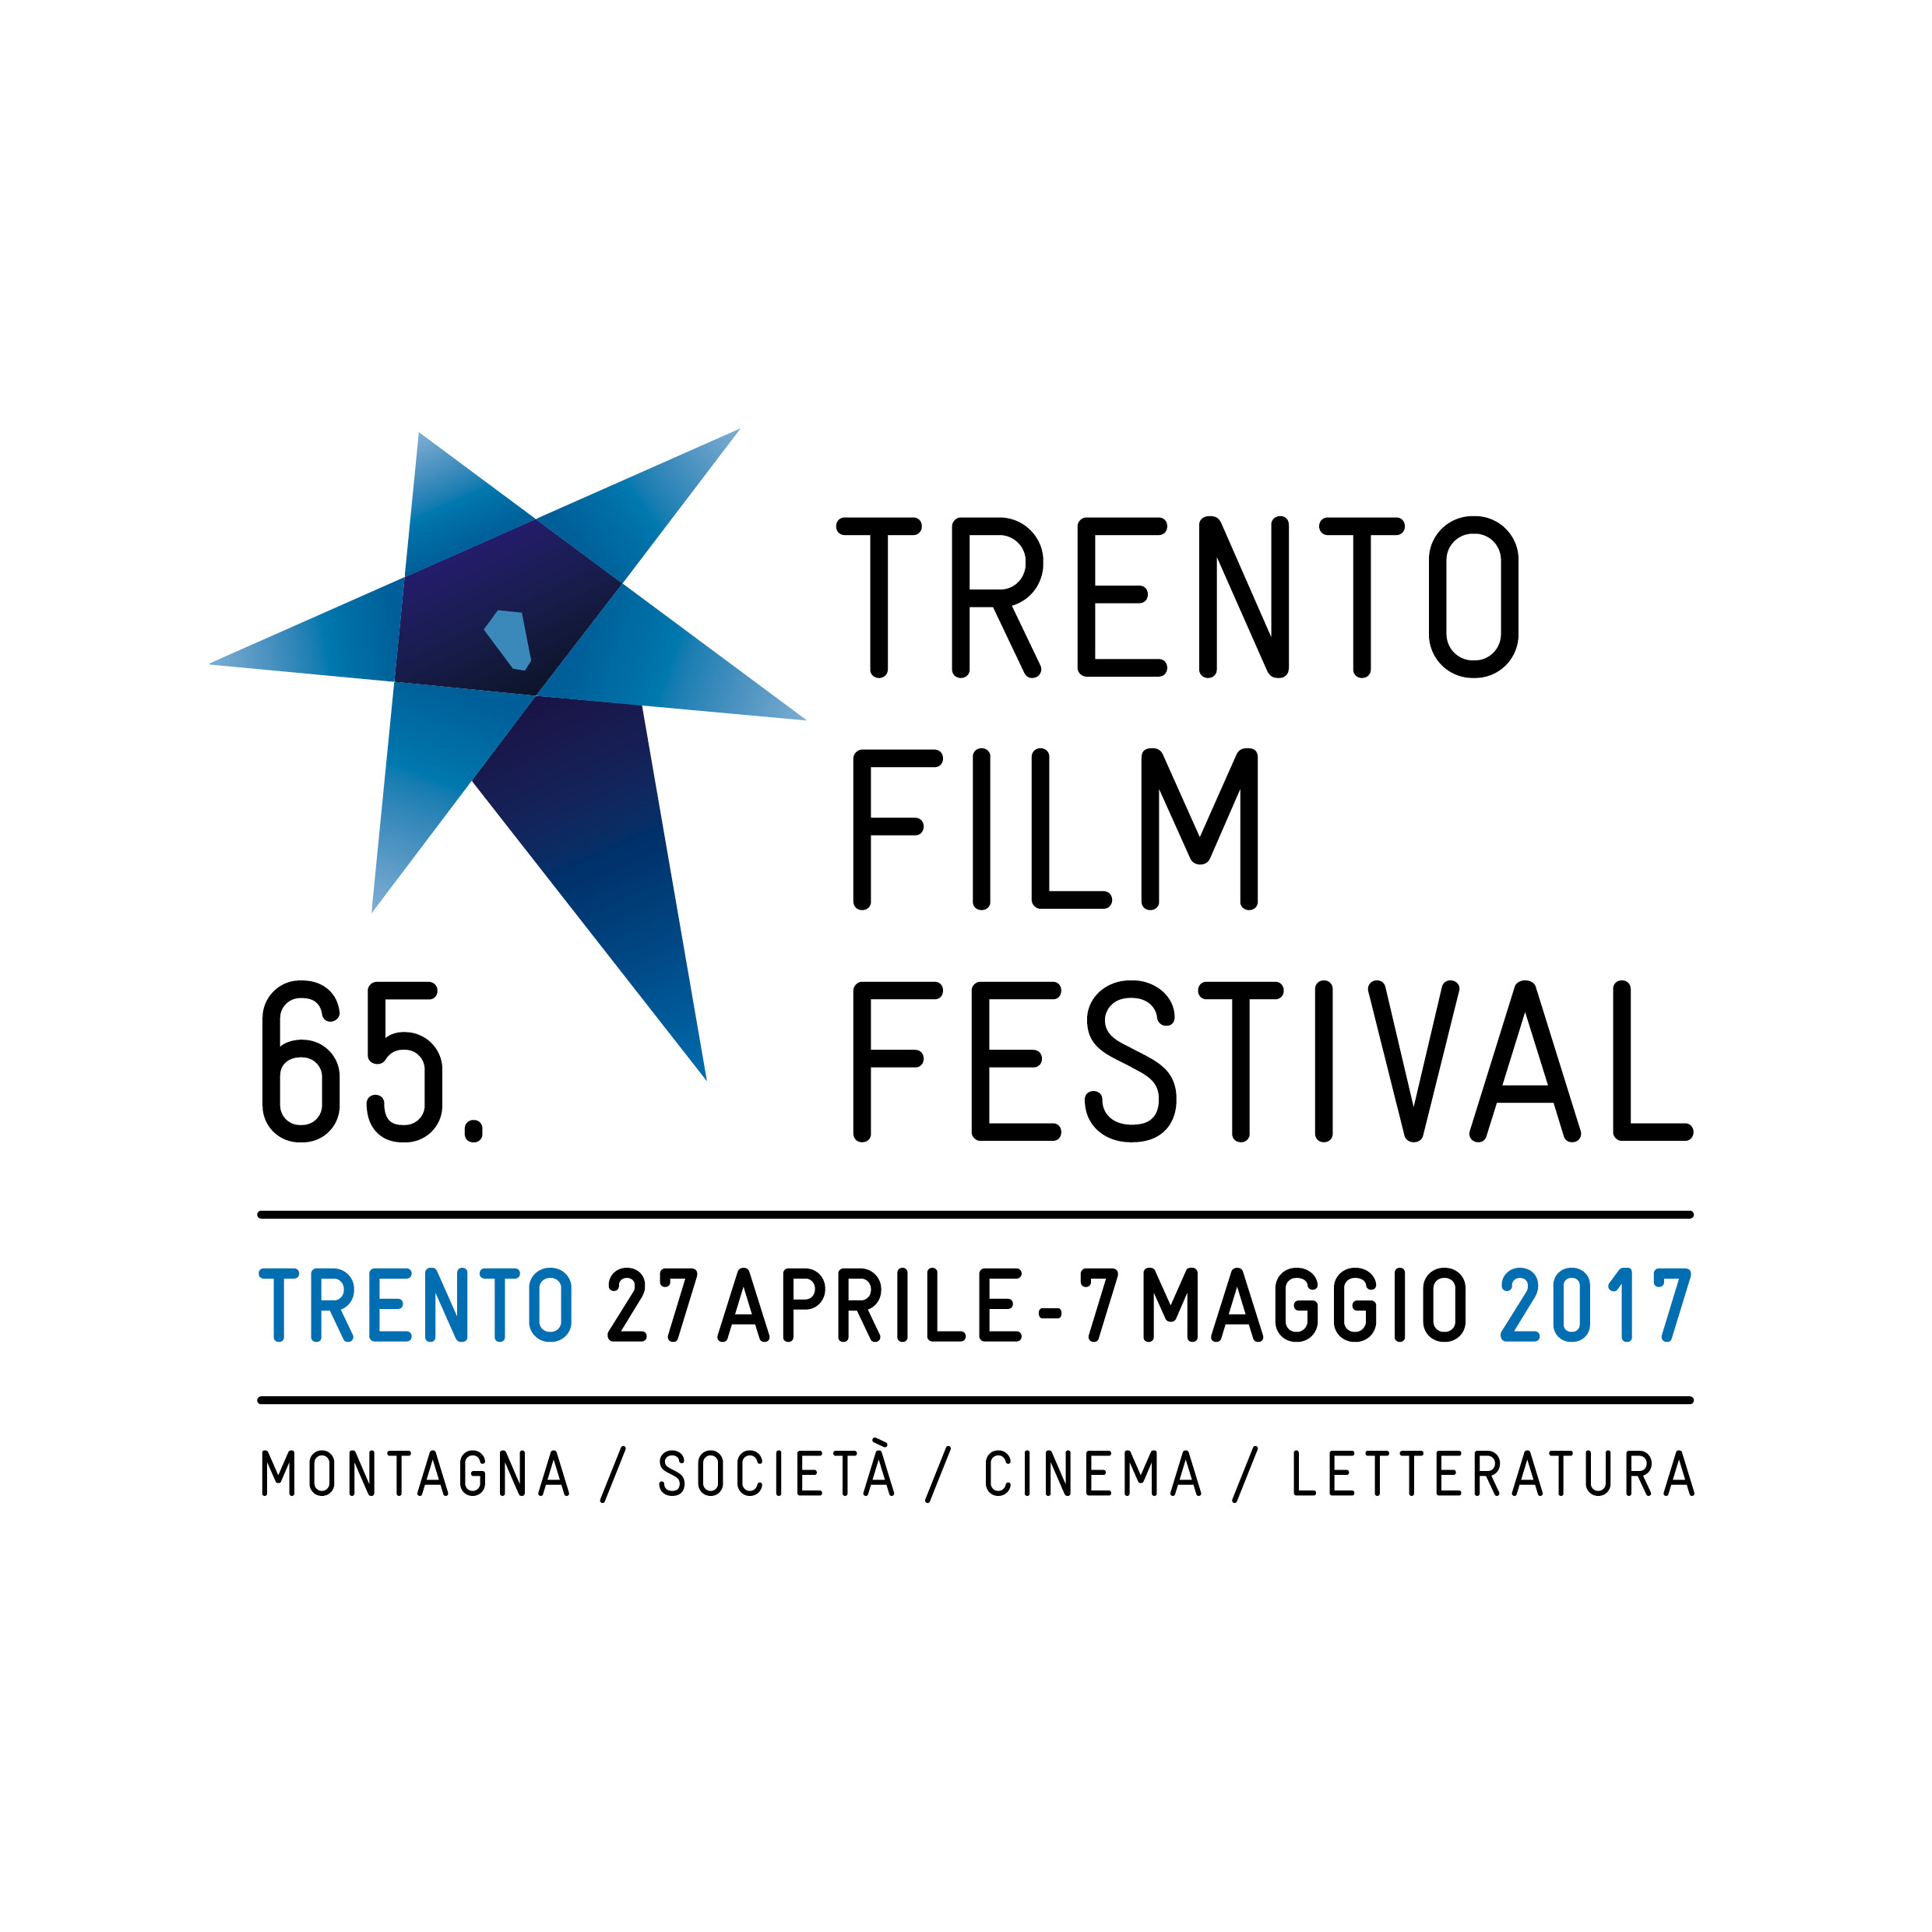 Trento Film Festival 2017